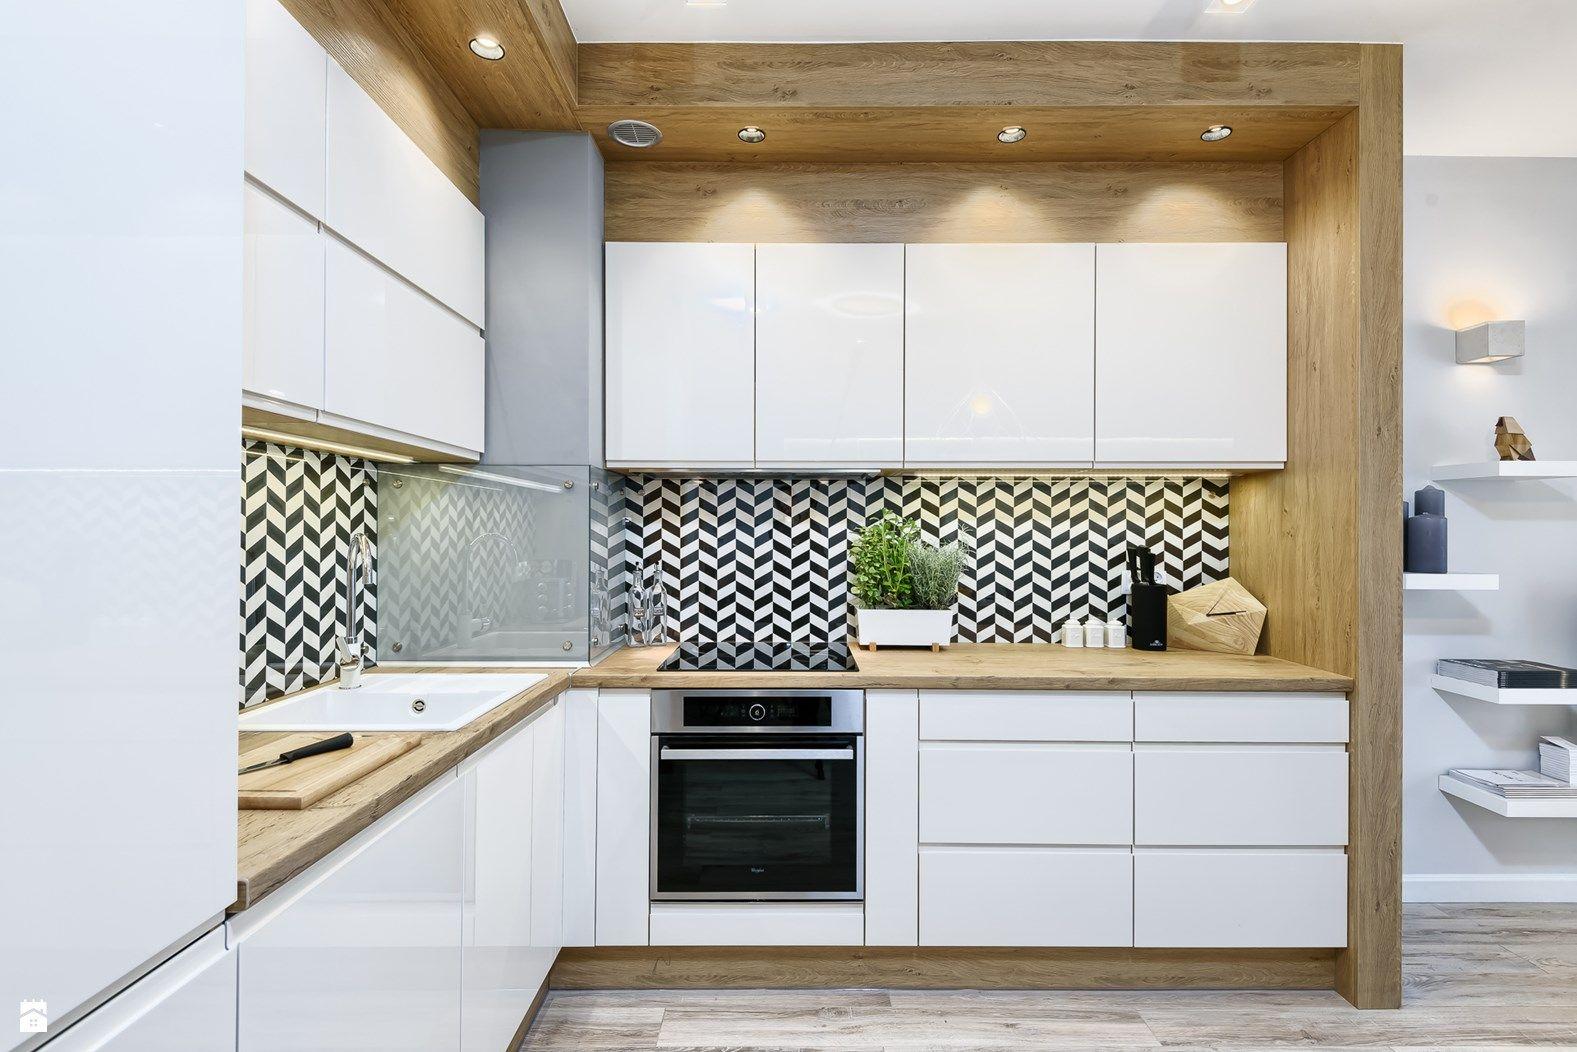 Kuchnia Plytki Czarno Biale Kuchnia Kitchen Cabinets Kitchen